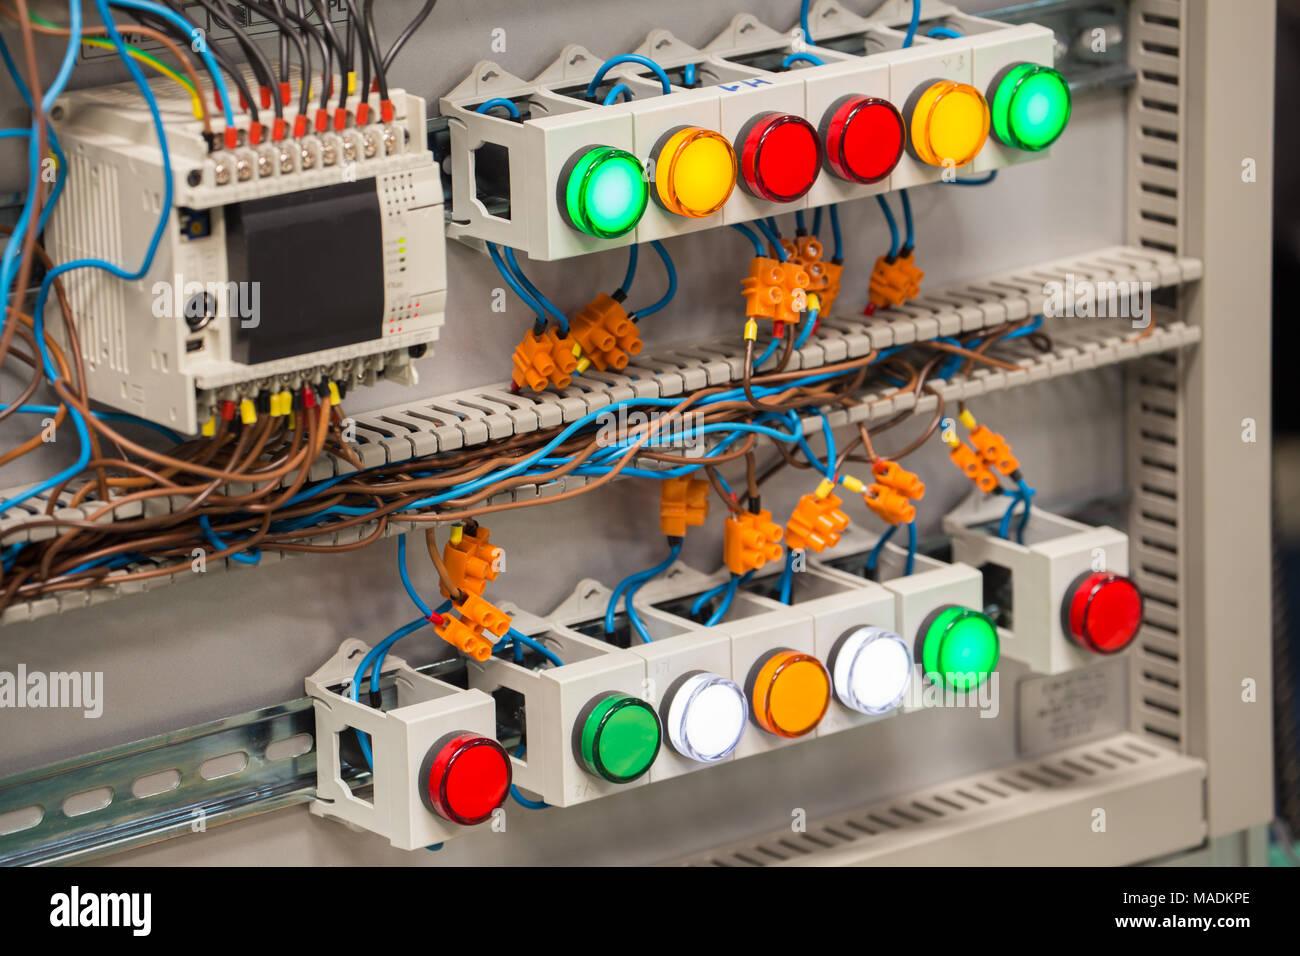 Electric Distribution Box Stock Photo 178551142 Alamy Home Wiring